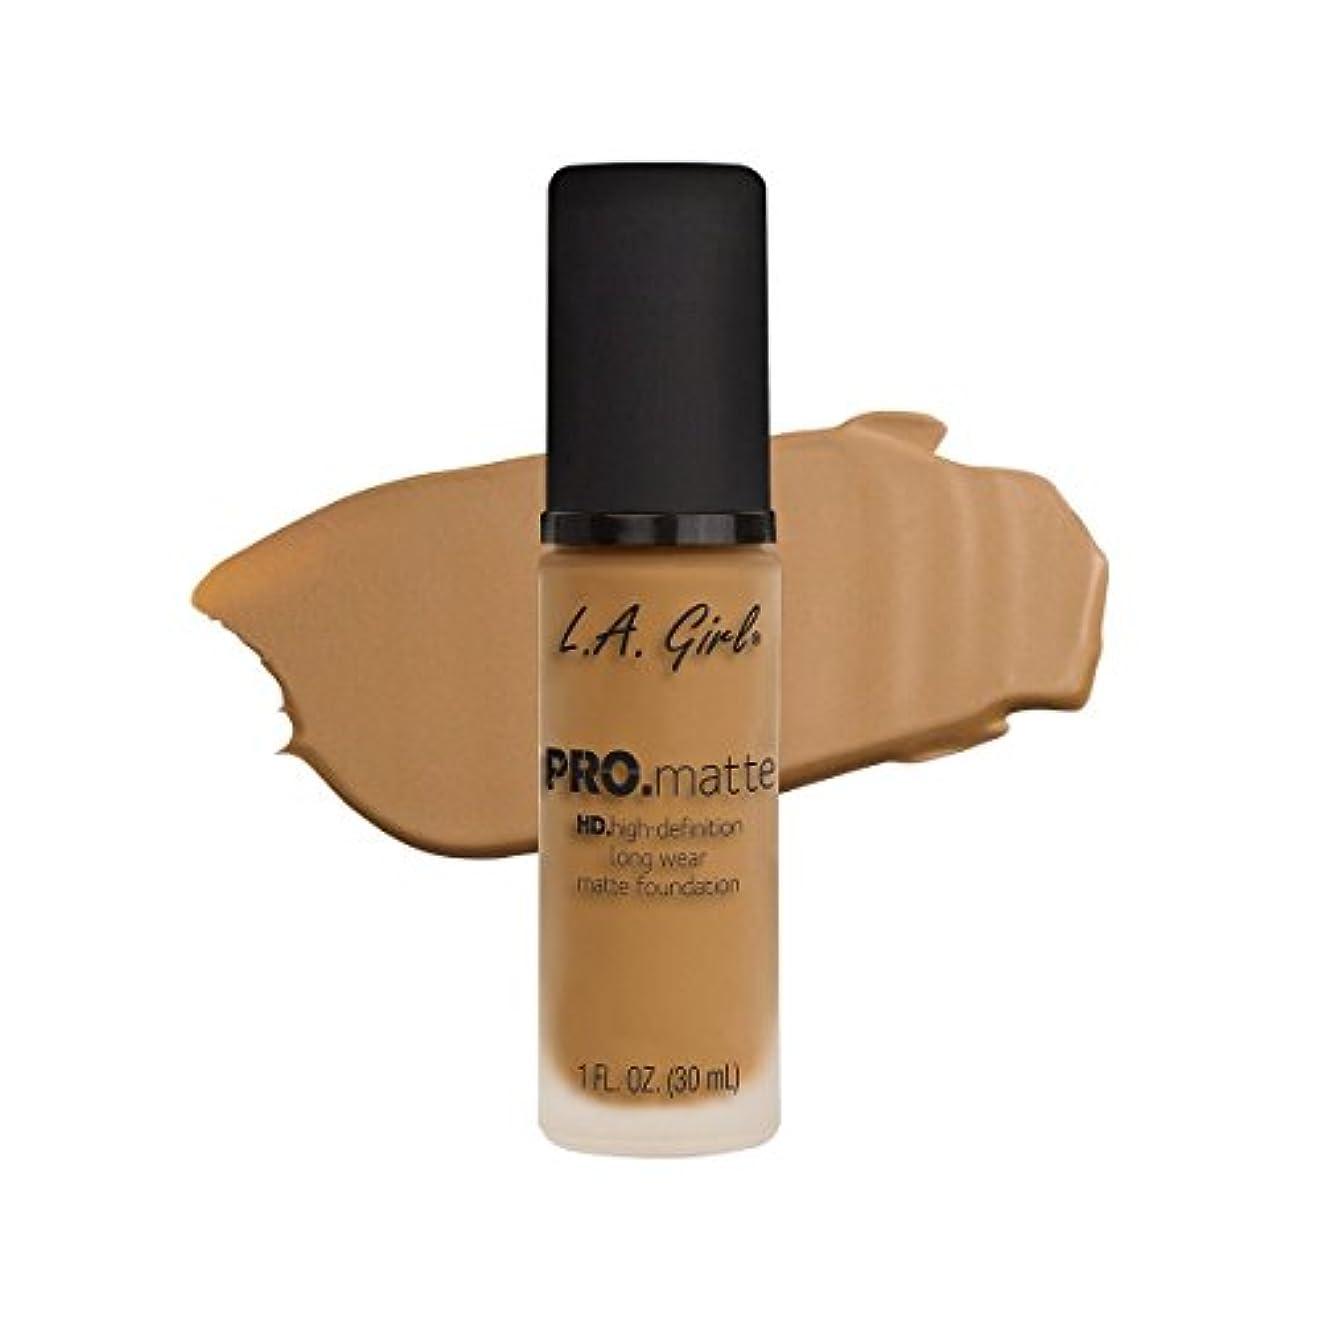 前奏曲旧正月方程式(3 Pack) L.A. GIRL Pro Matte Foundation - Sand (並行輸入品)